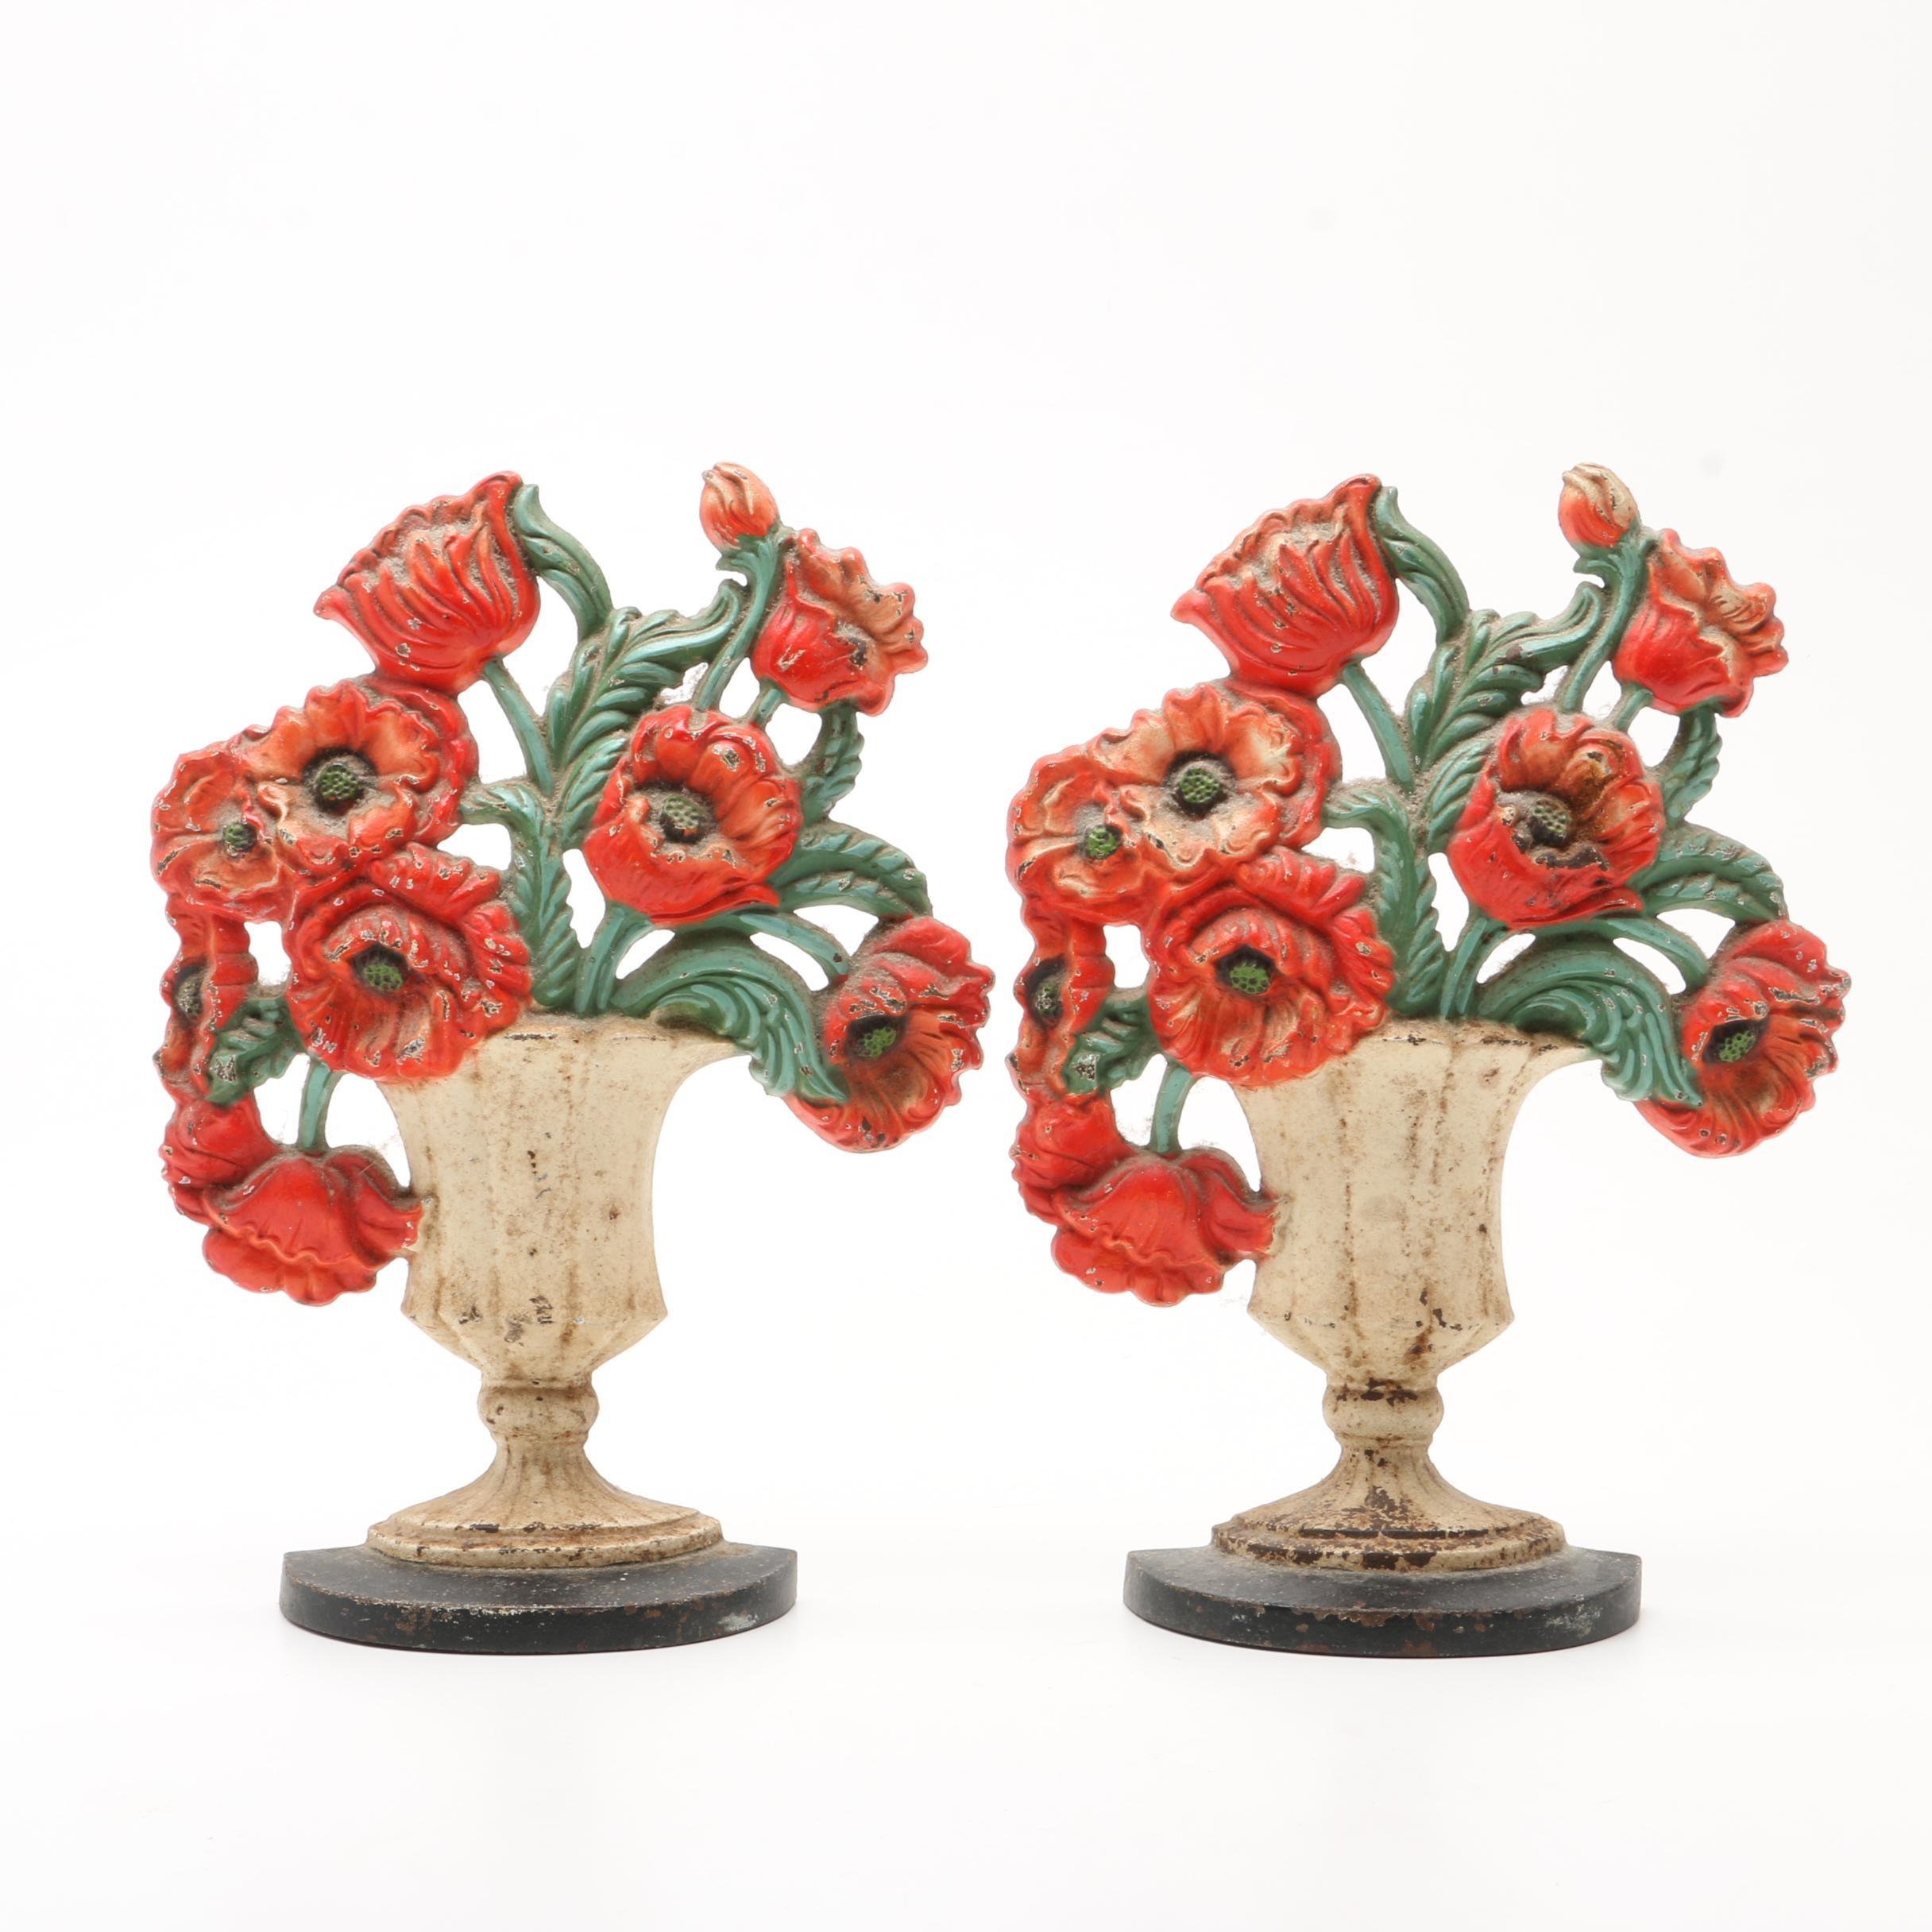 Hubley Cast Iron Floral Poppy Urn Doorstops